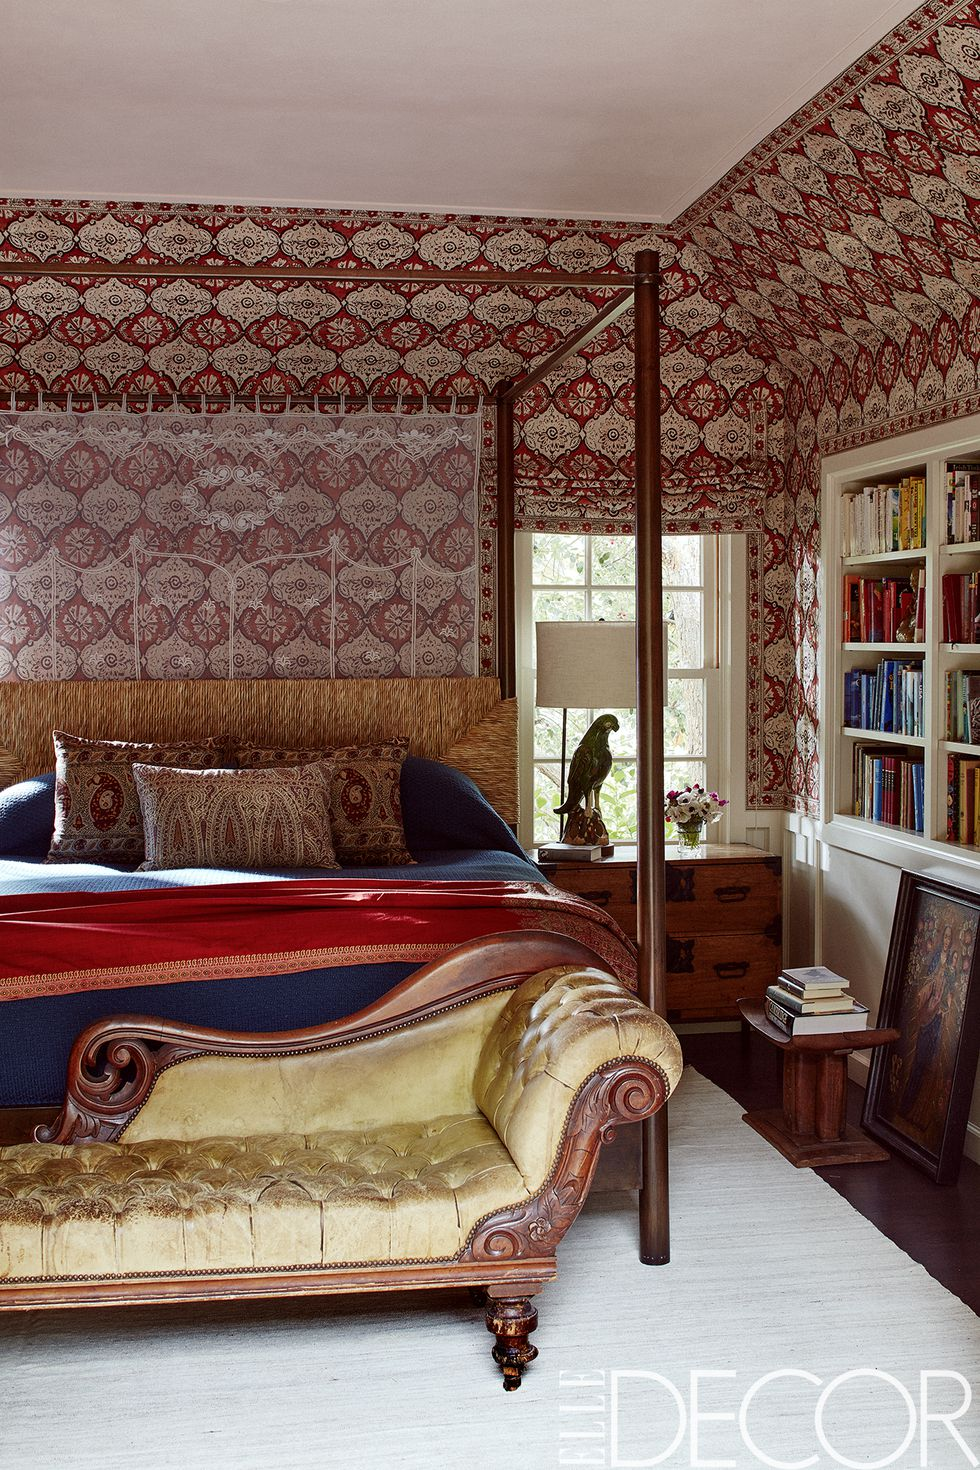 Minnie Driver Elle Decor Bedroom.jpg